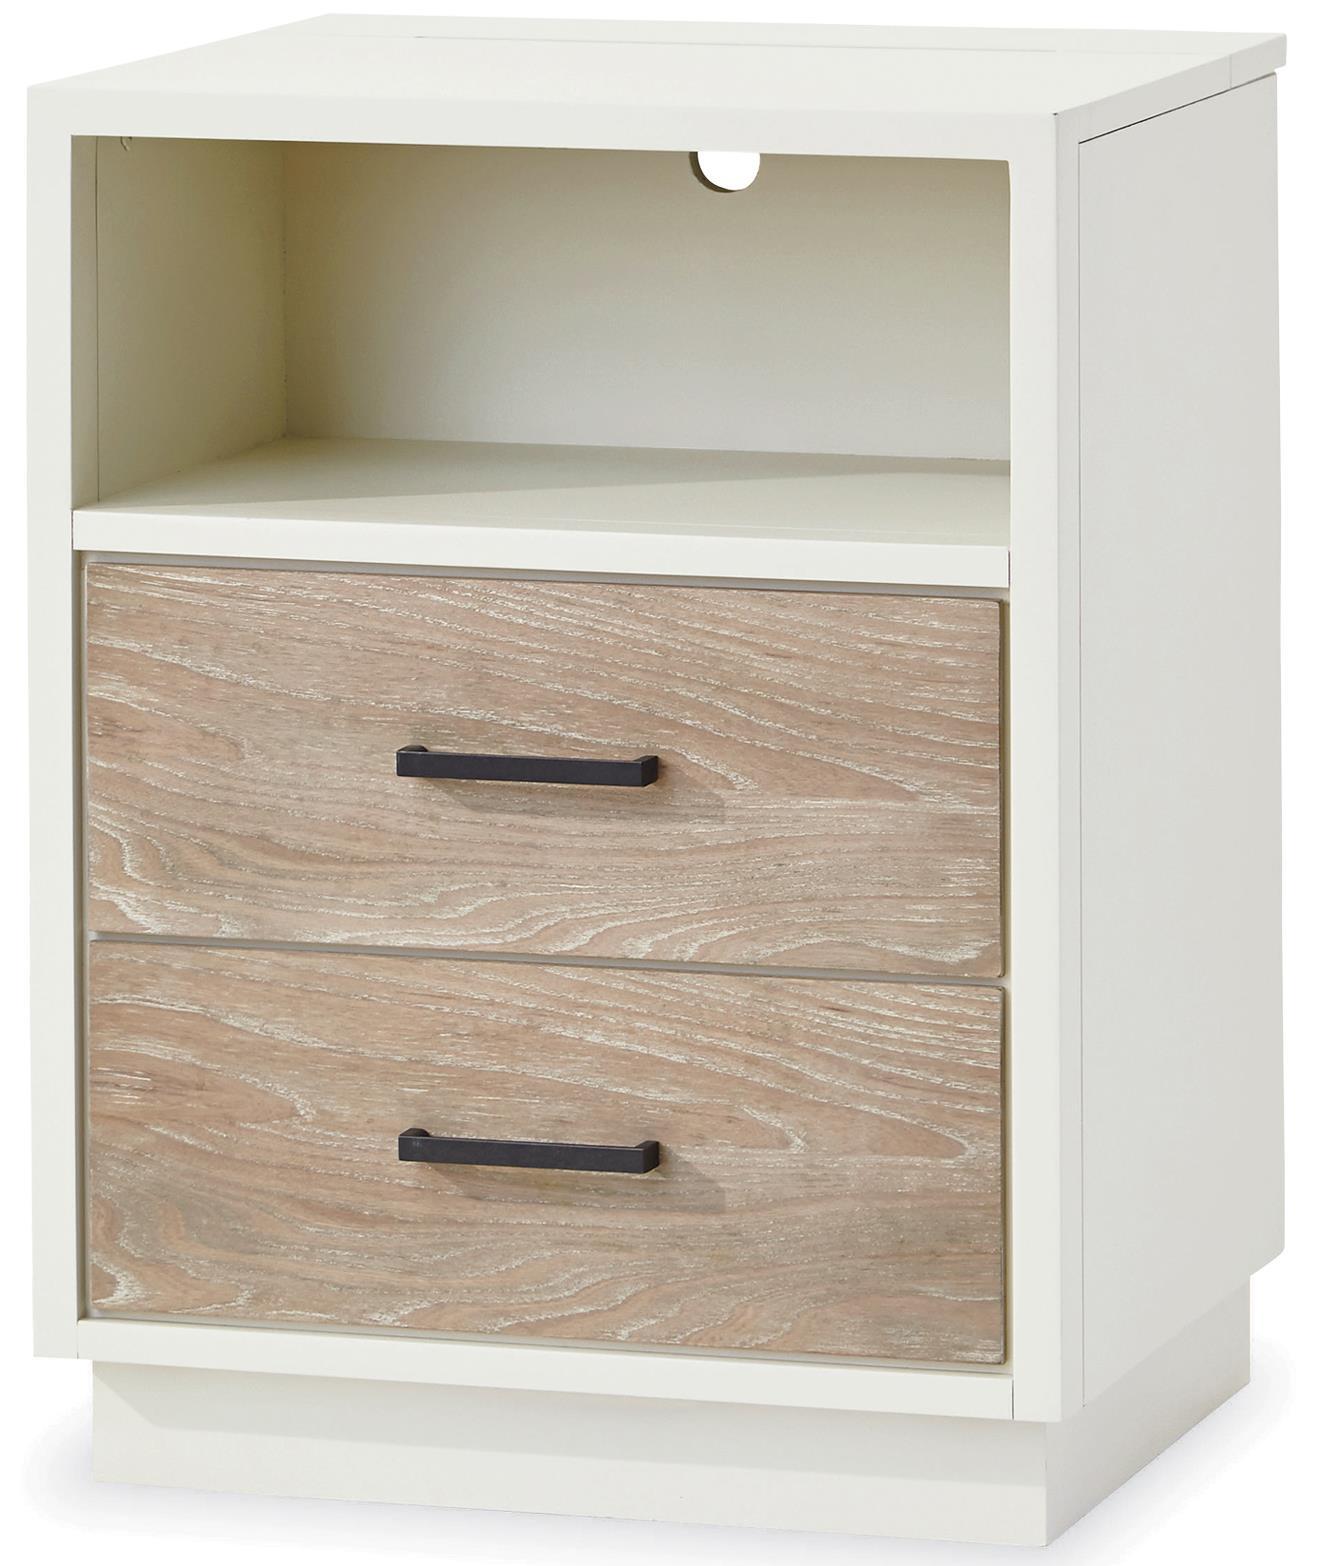 #myRoom 2 Drawer Nightstand by Smartstuff at HomeWorld Furniture